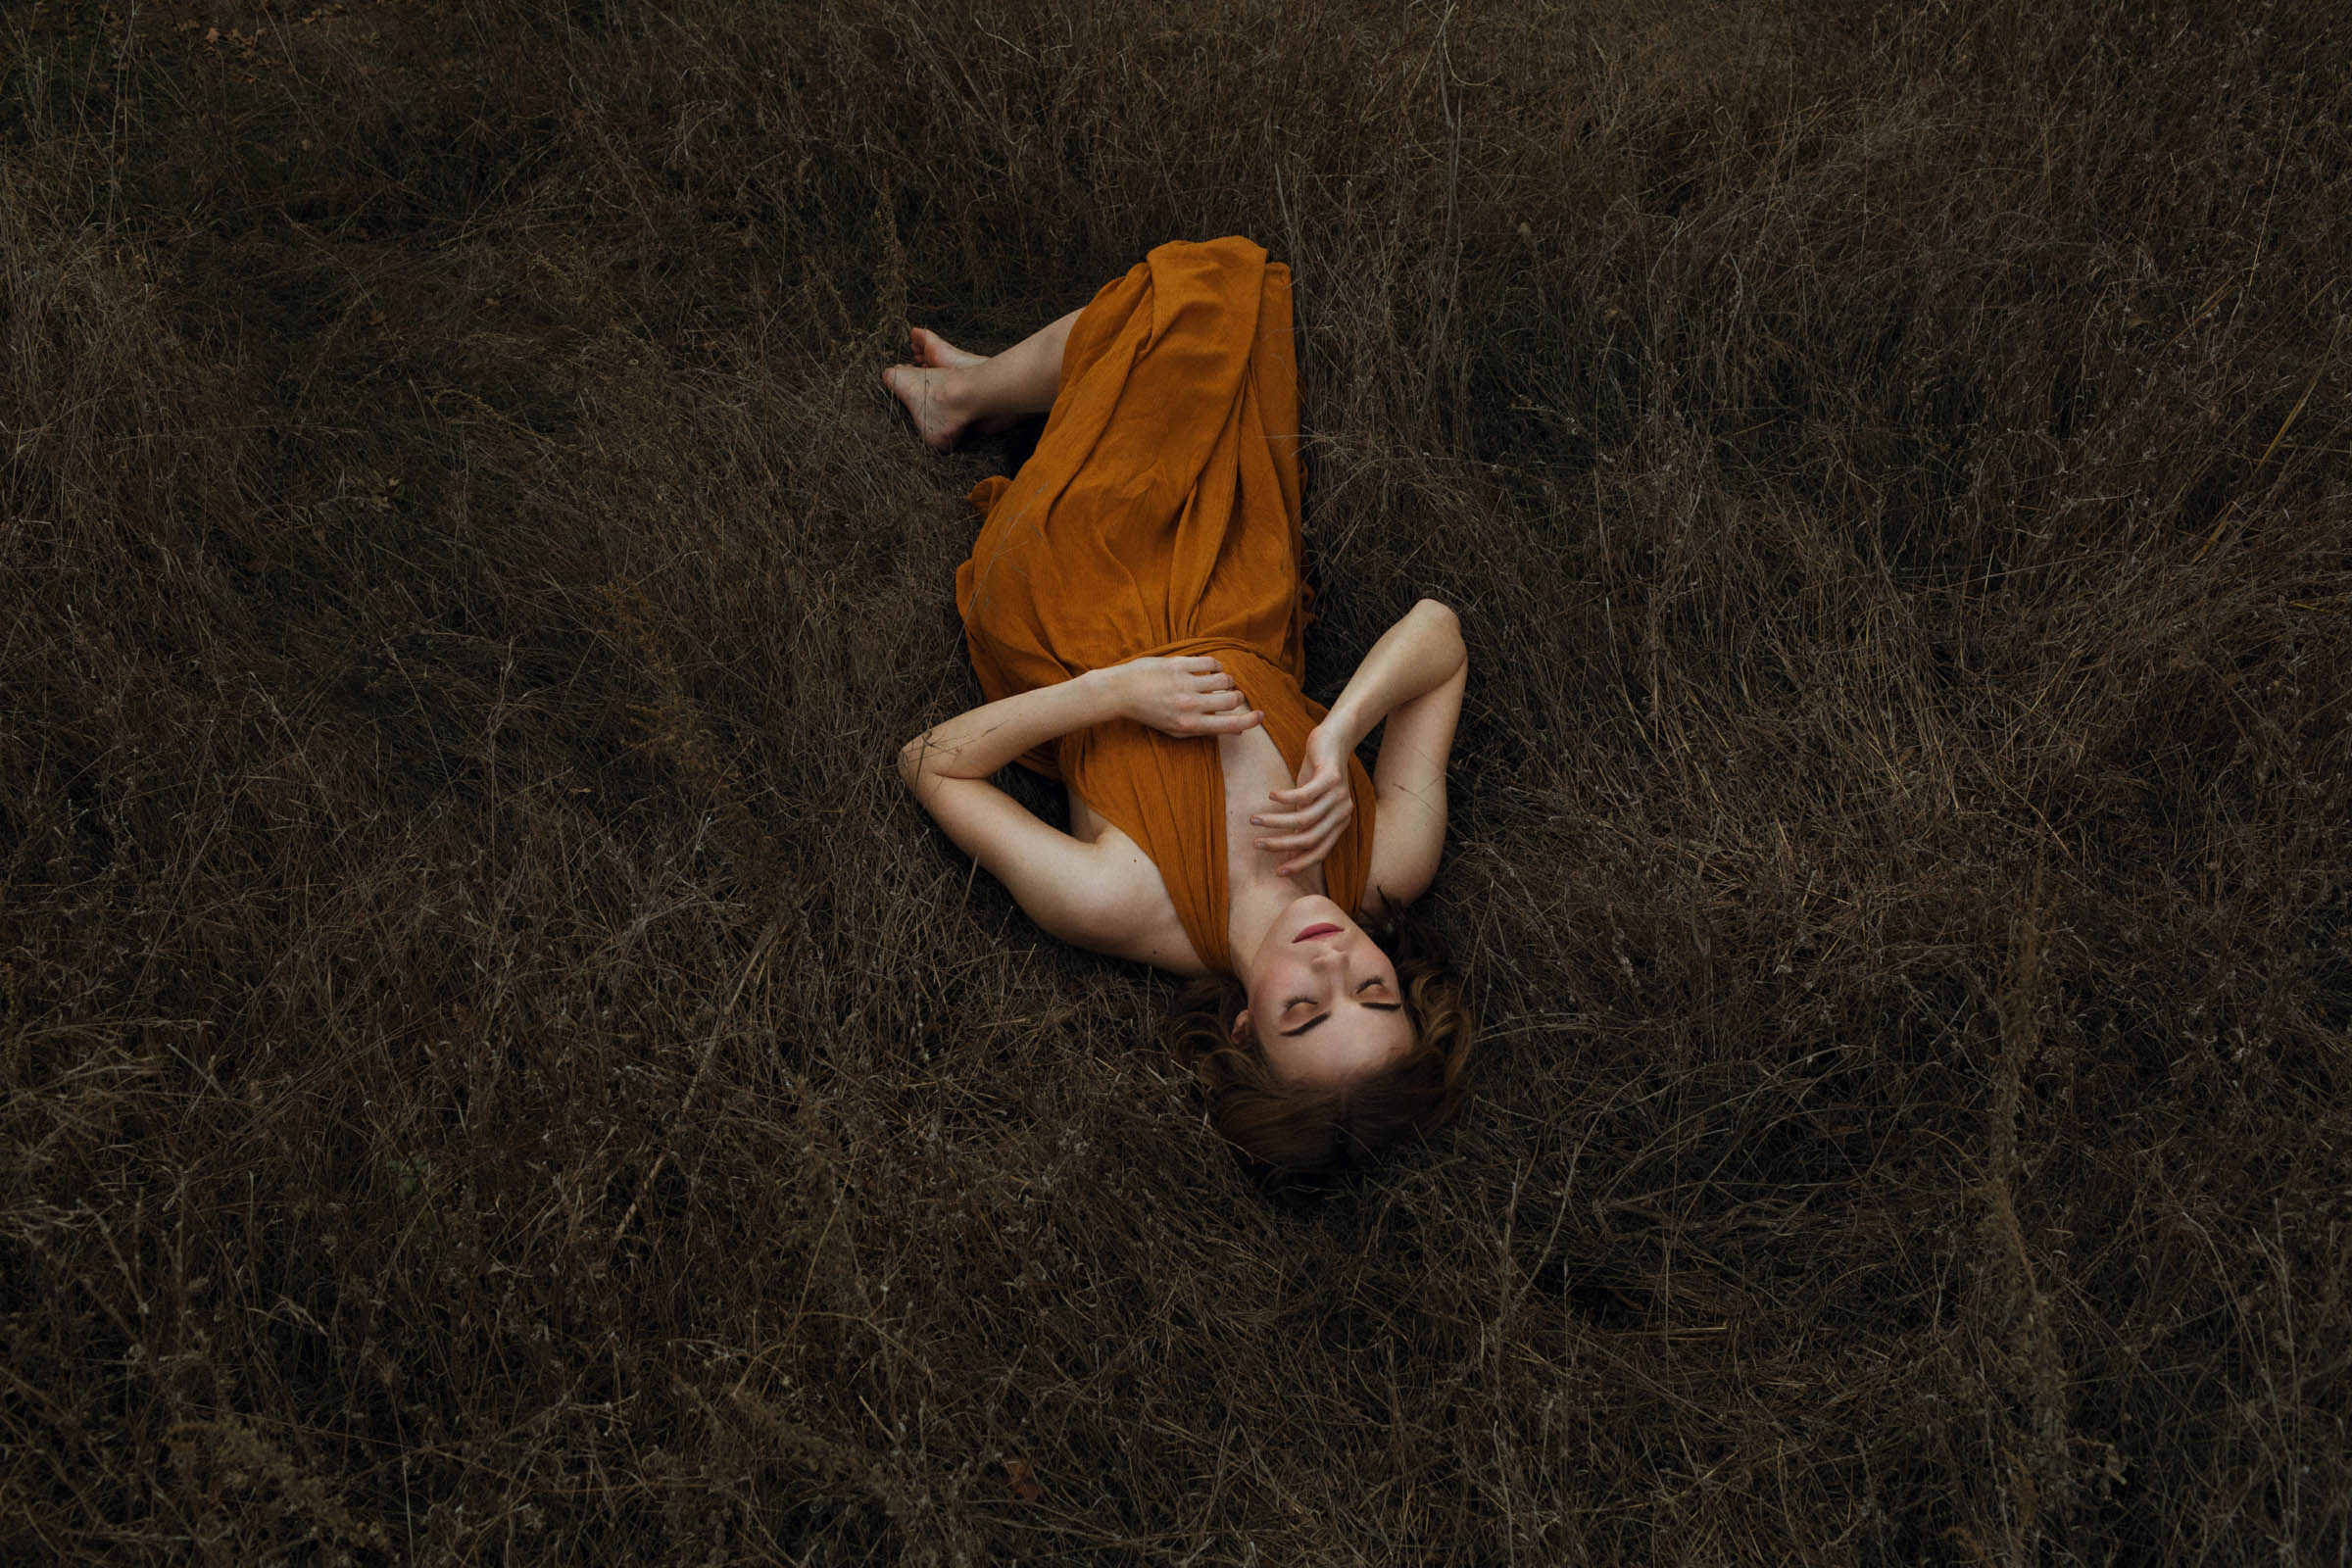 meredith-grass-007.jpg